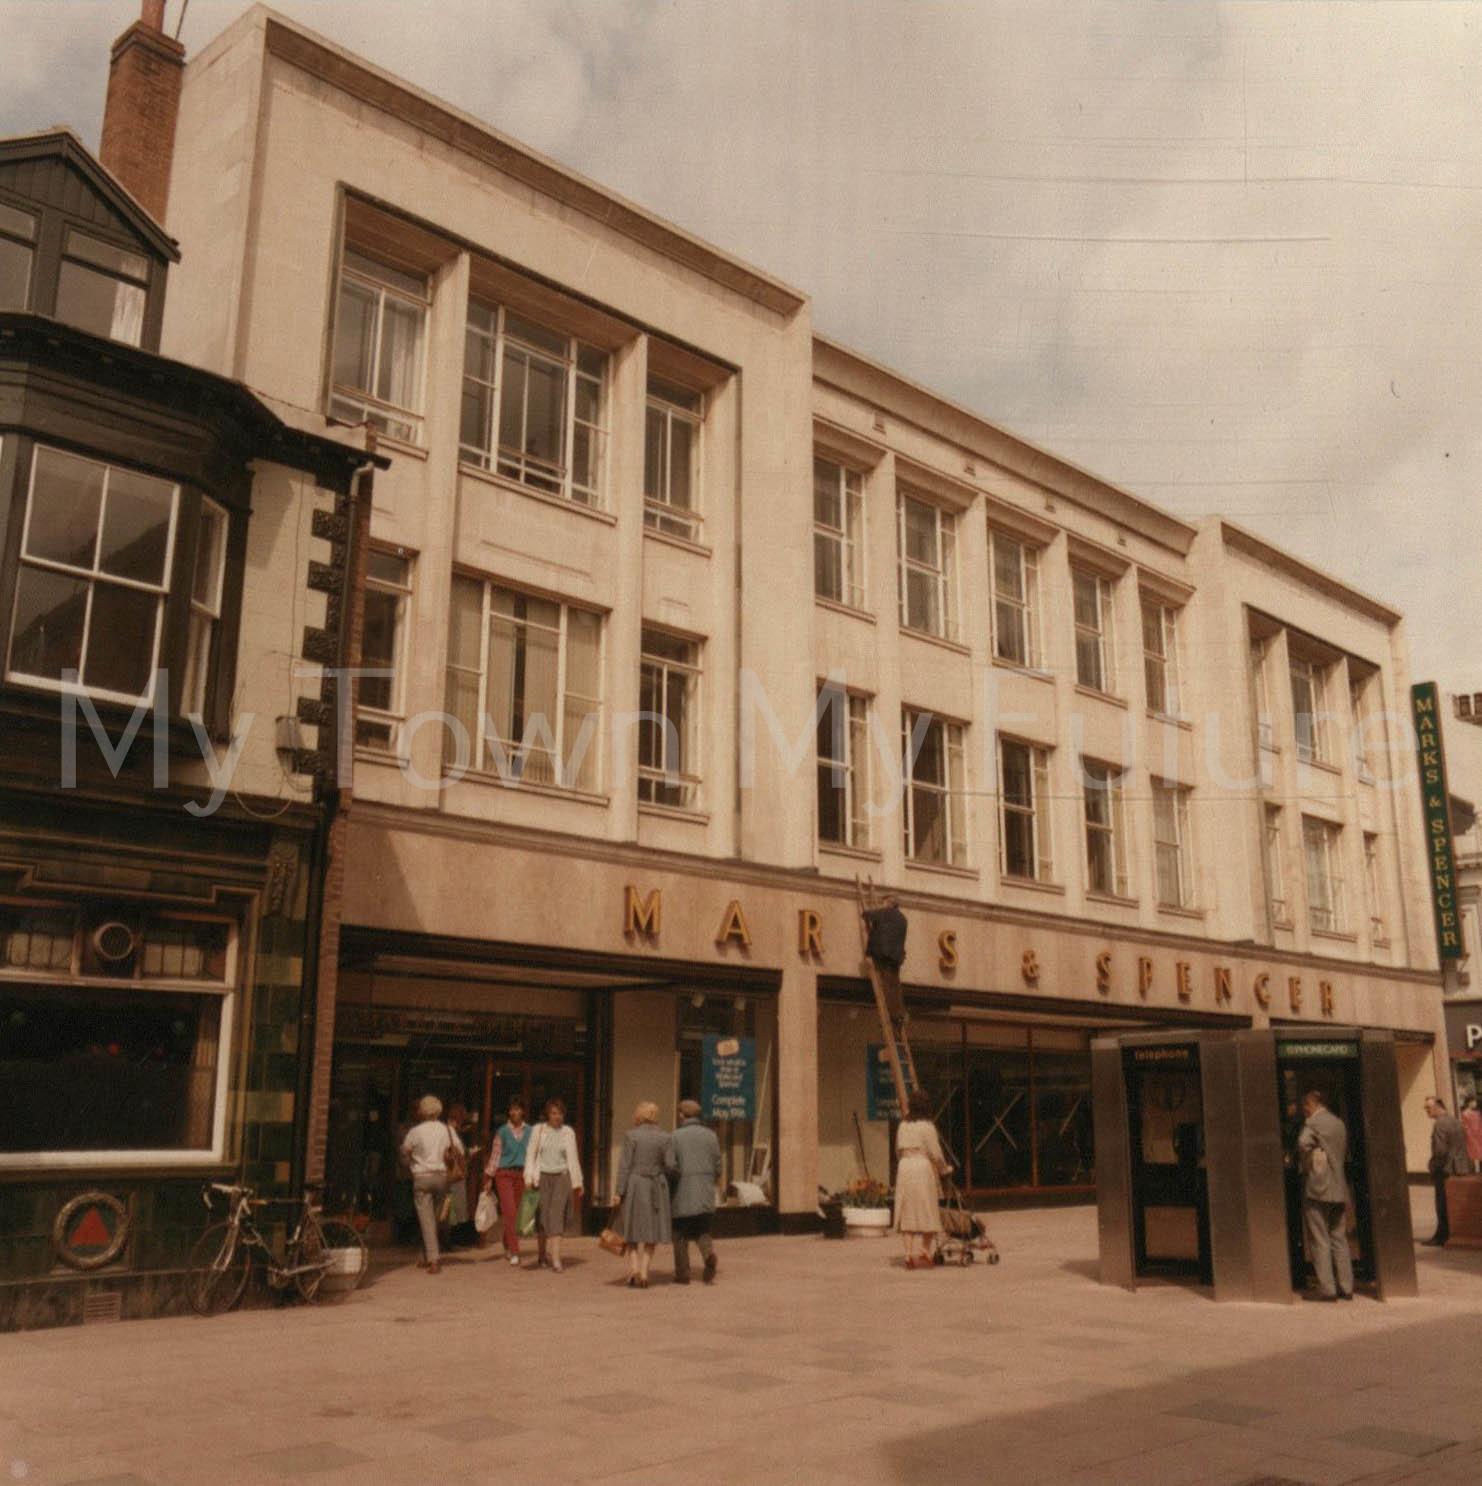 Linthorpe Road Shops